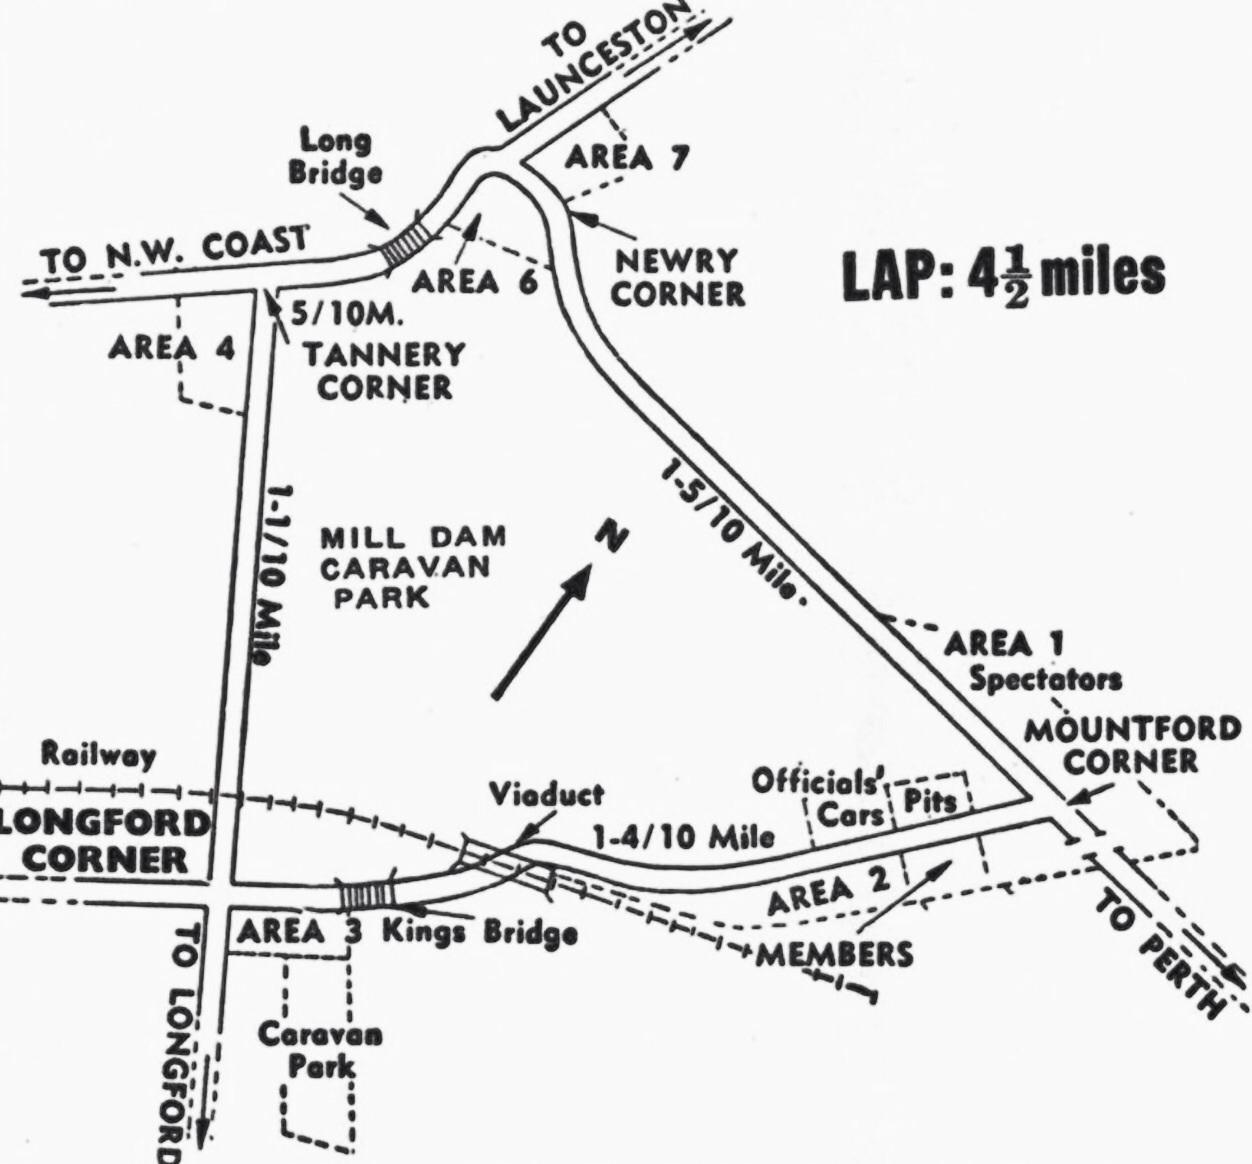 Wonder Bar Radio Circuit Diagram For The 1960 Chevrolet Passenger Car